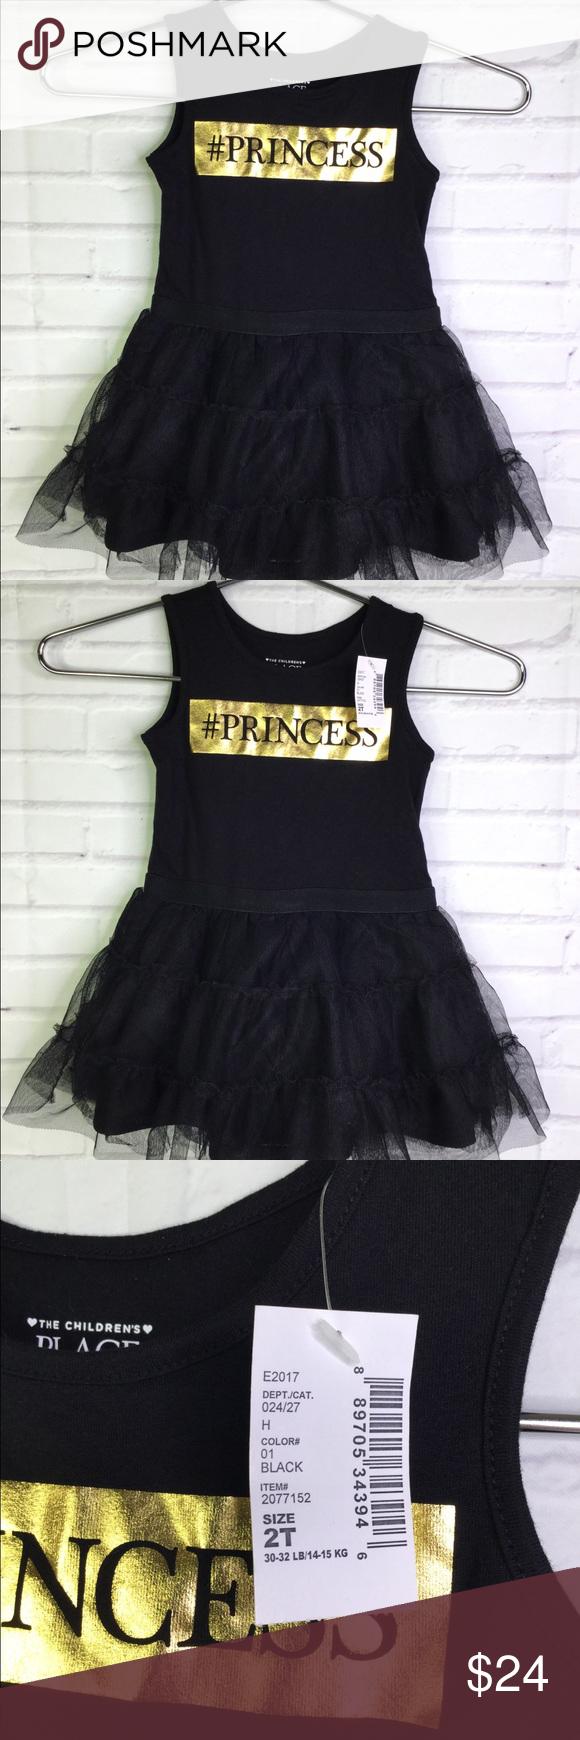 Children S Place Princess Tutu Dress Girls 2t New Tutu Dress Dresses Girls Dresses [ 1740 x 580 Pixel ]